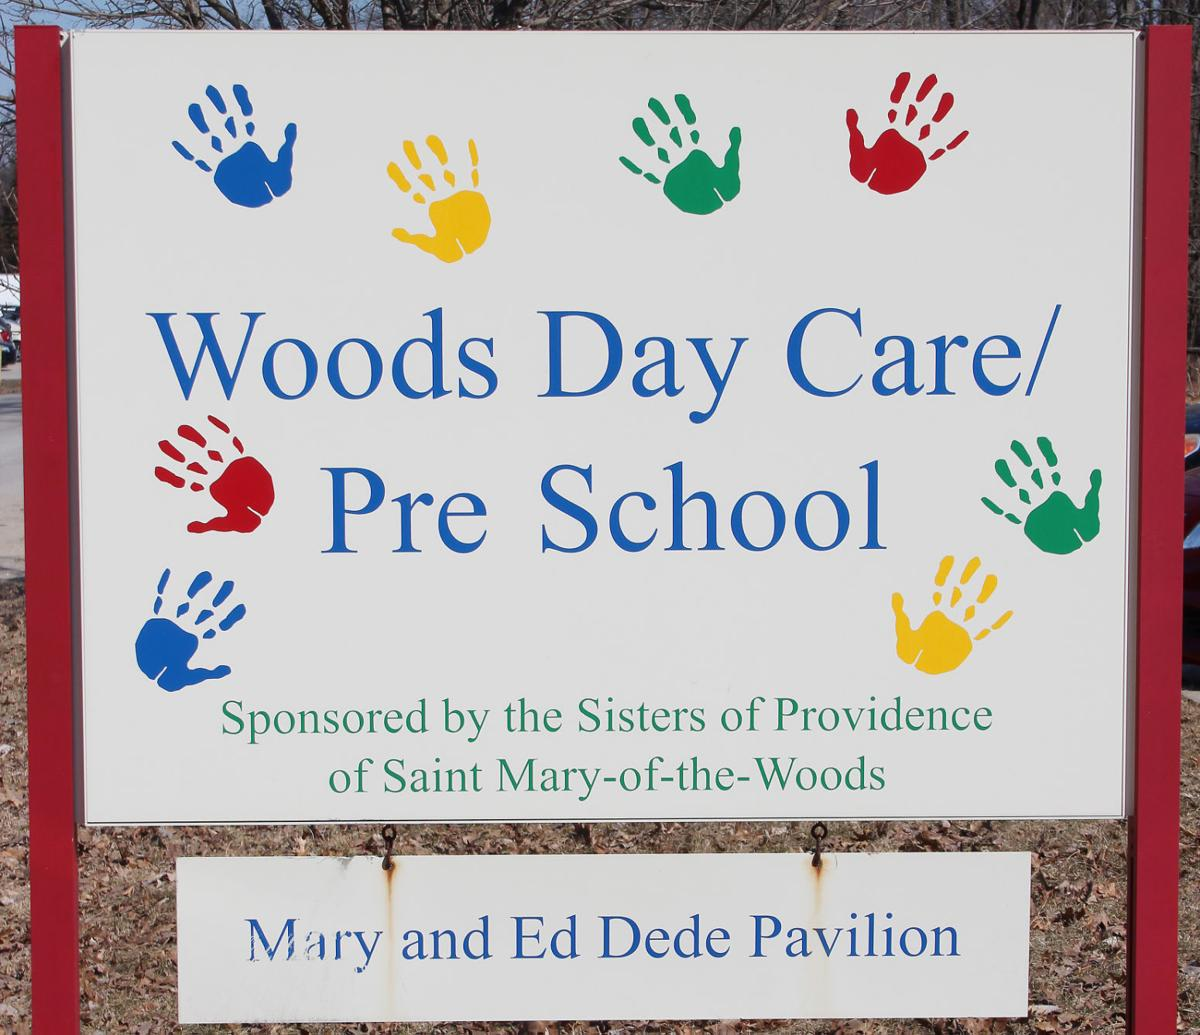 Vigo County School Calendar.Sisters Of Providence To Close Woods Day Care Pre School In June